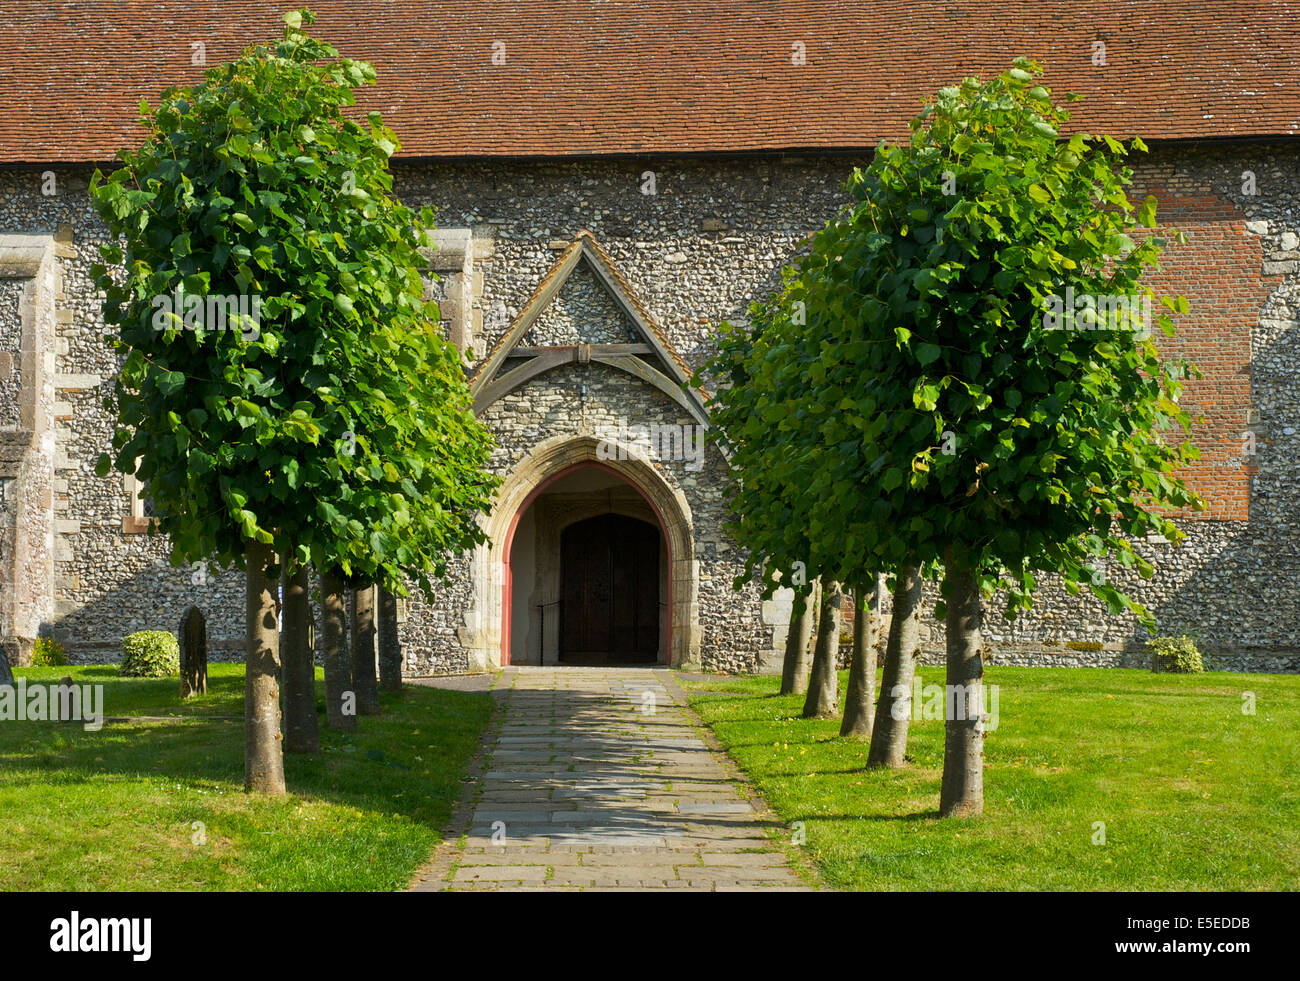 Tree-lined path to All Saints Church, Odiham, Hampshire, England uk - Stock Image